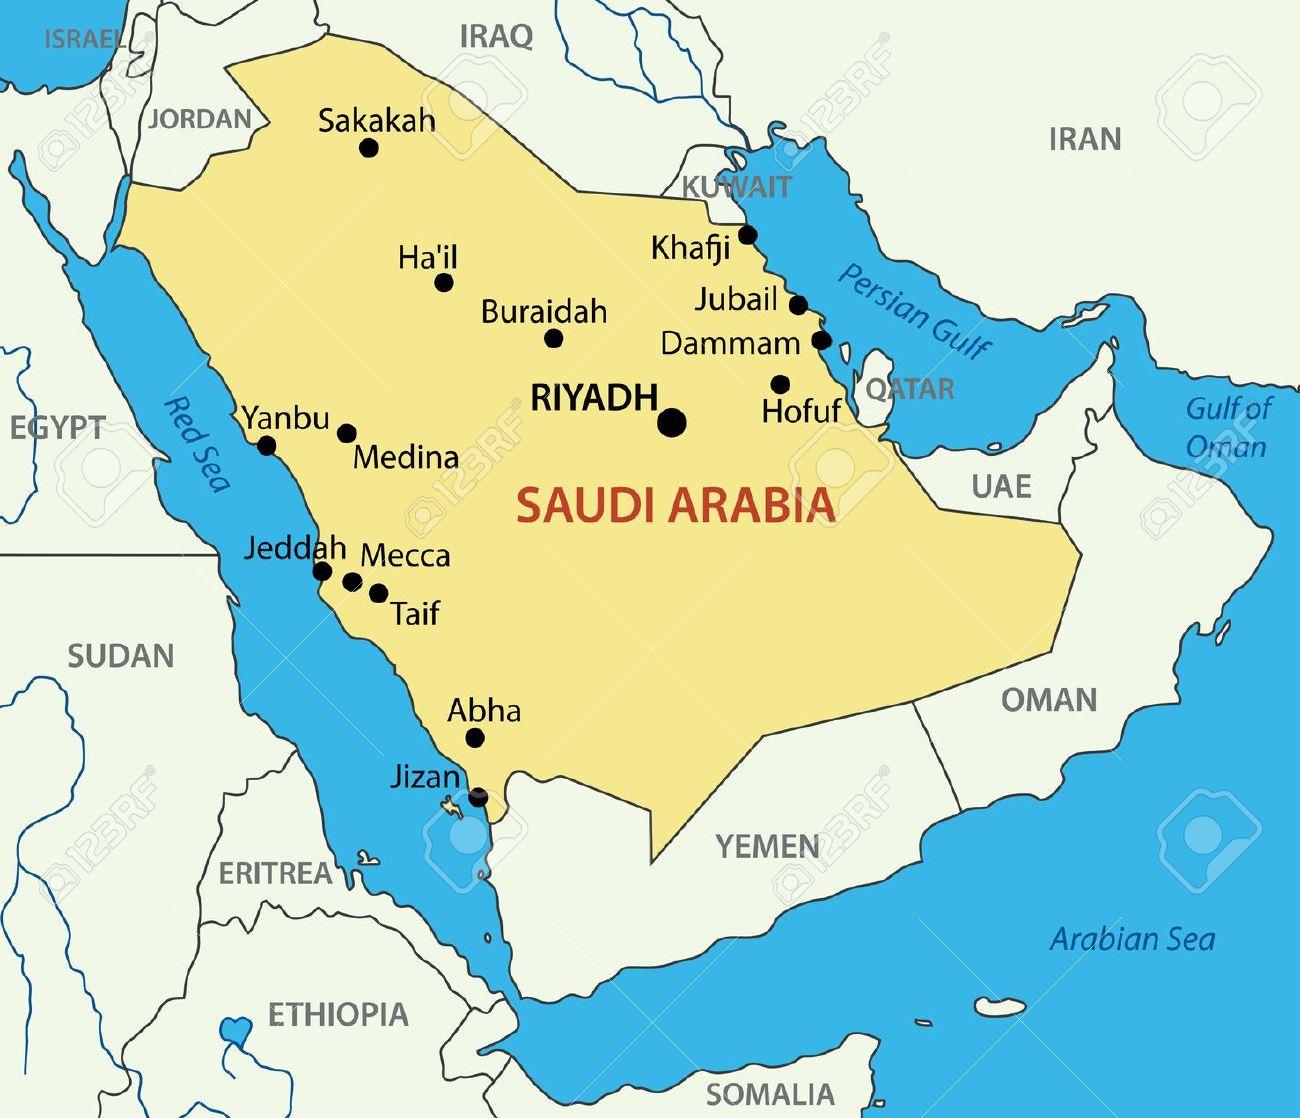 Kingdom Of Saudi Arabia Royalty Free Cliparts, Vectors, And Stock.